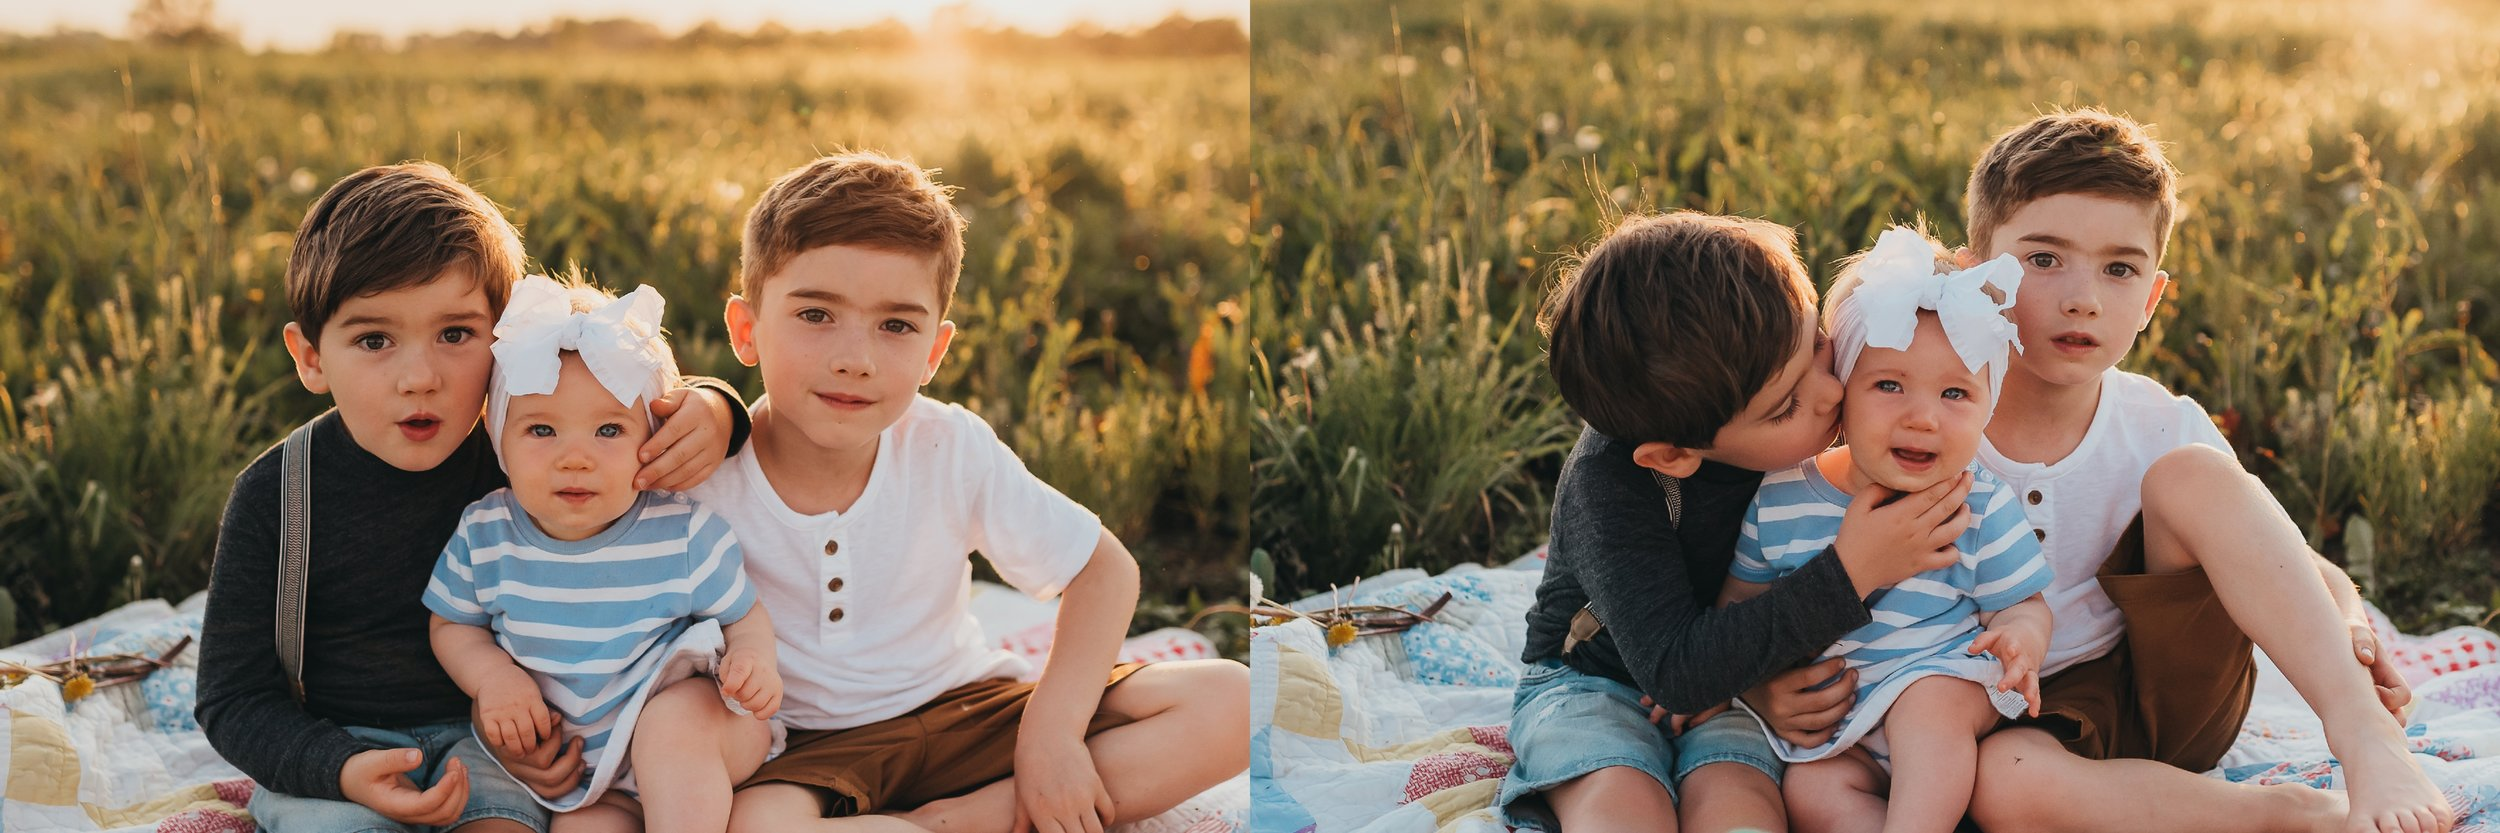 St. Louis Child Photographer